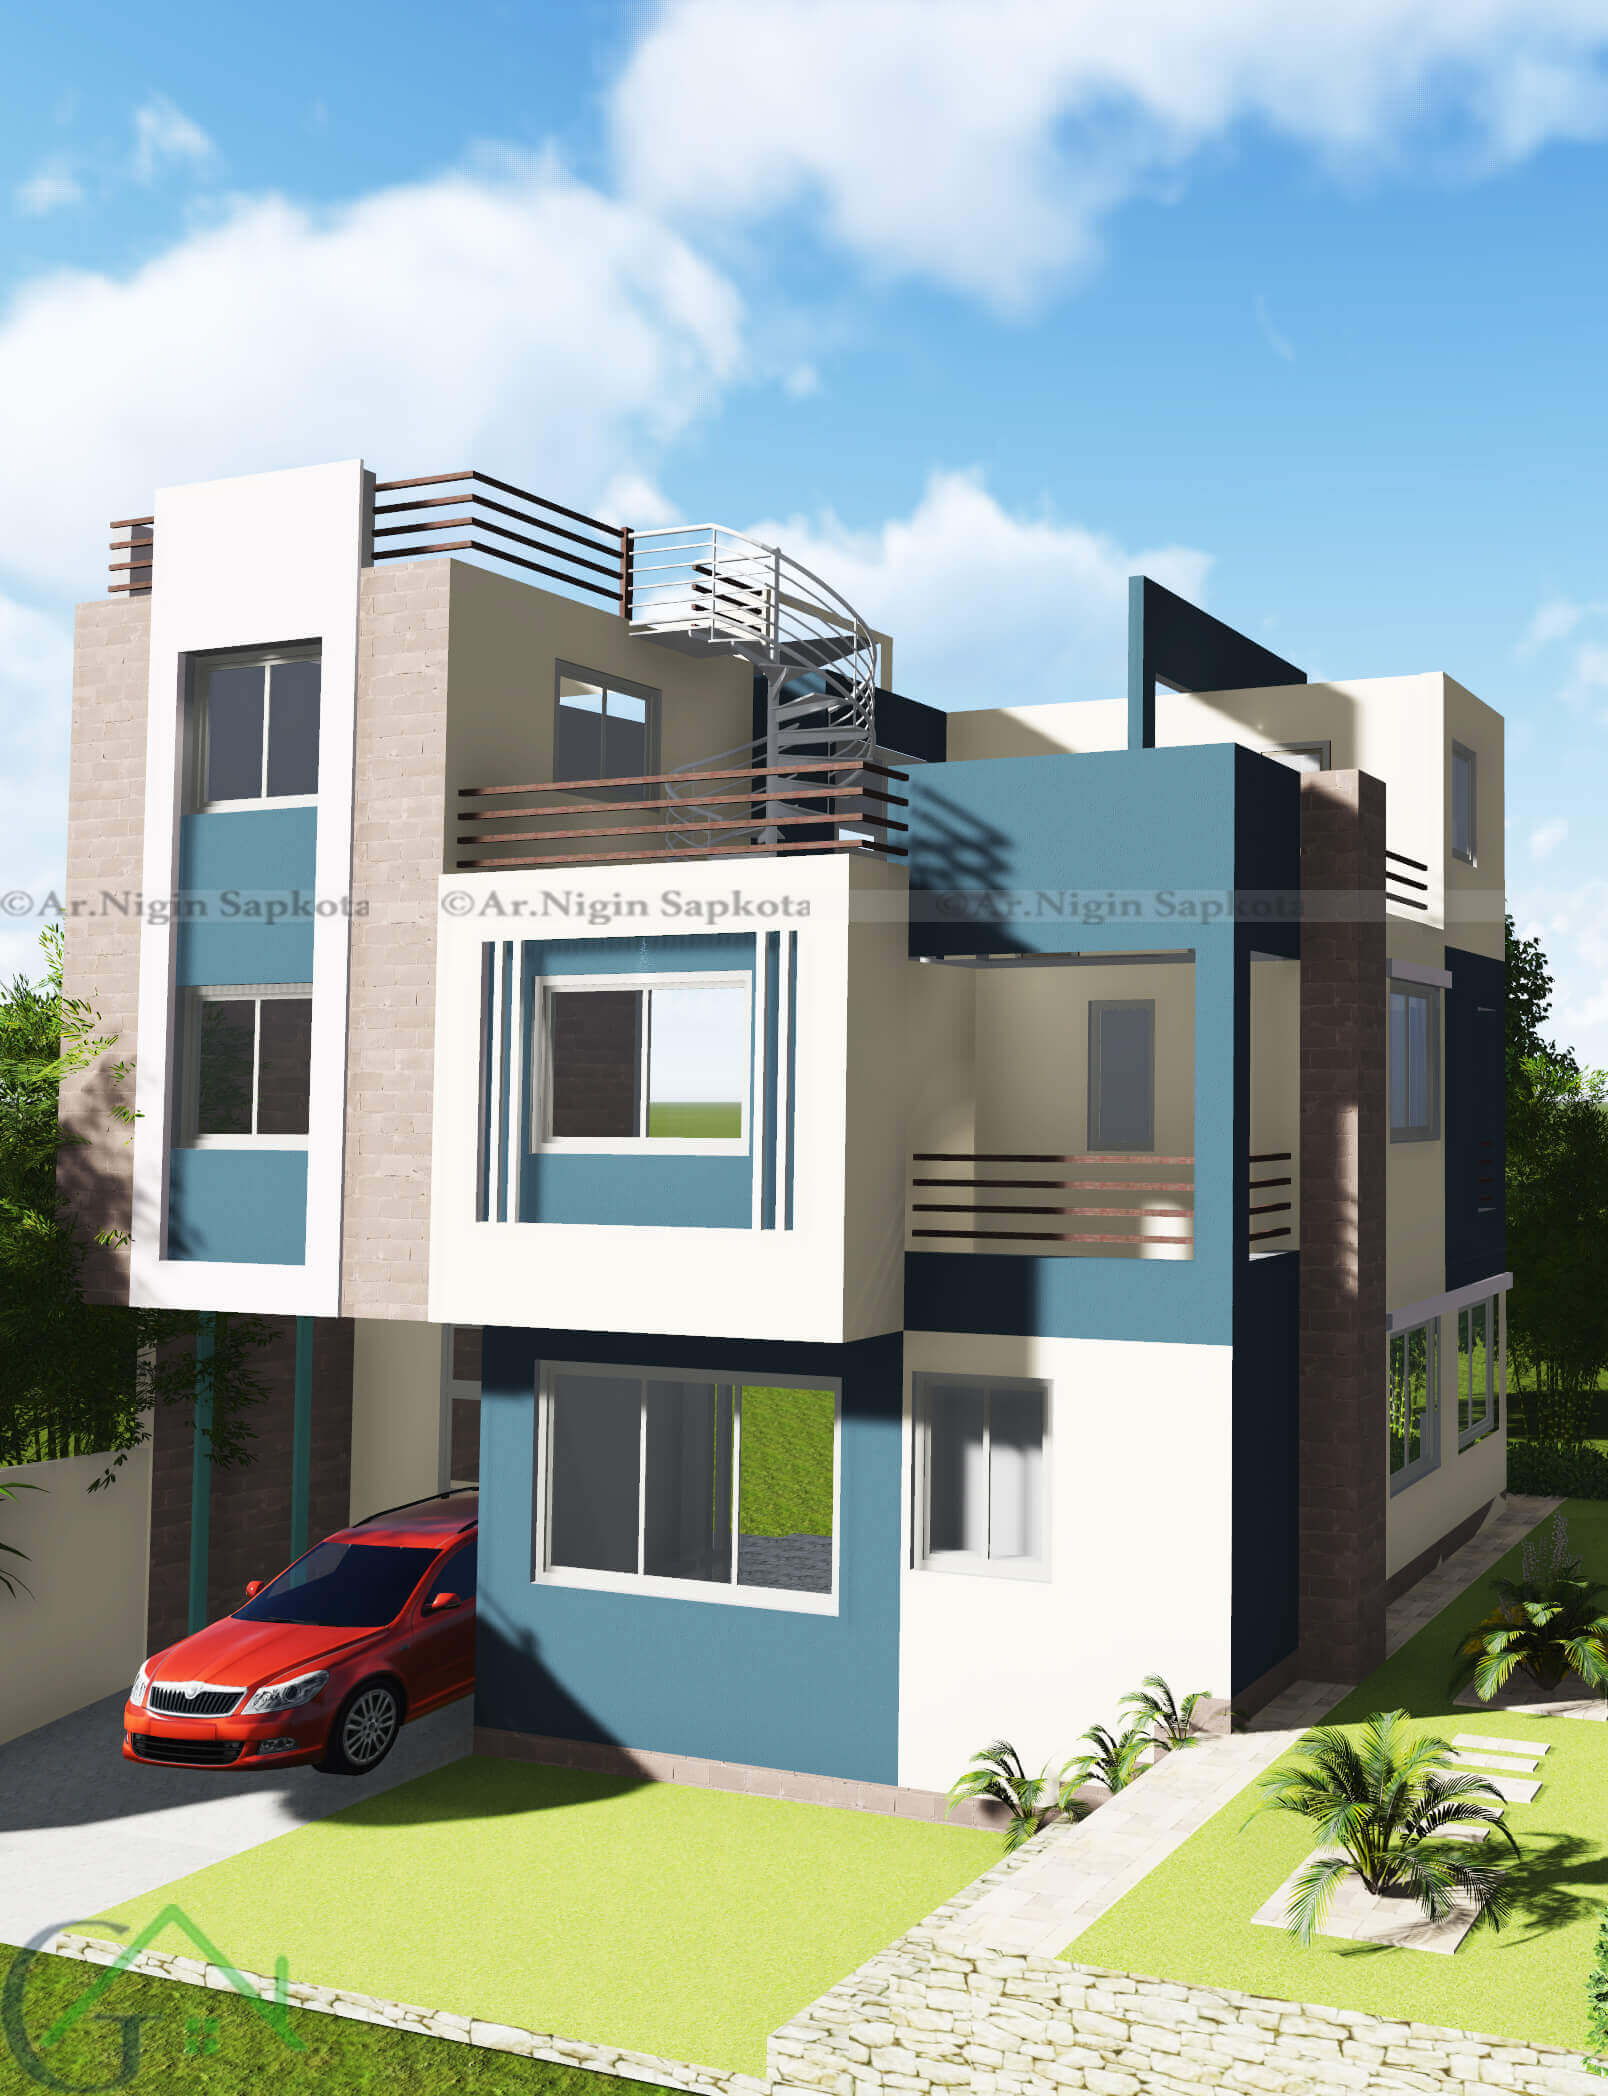 kapan-house-3d-design - G.A Builders, Kathmandu, Nepal